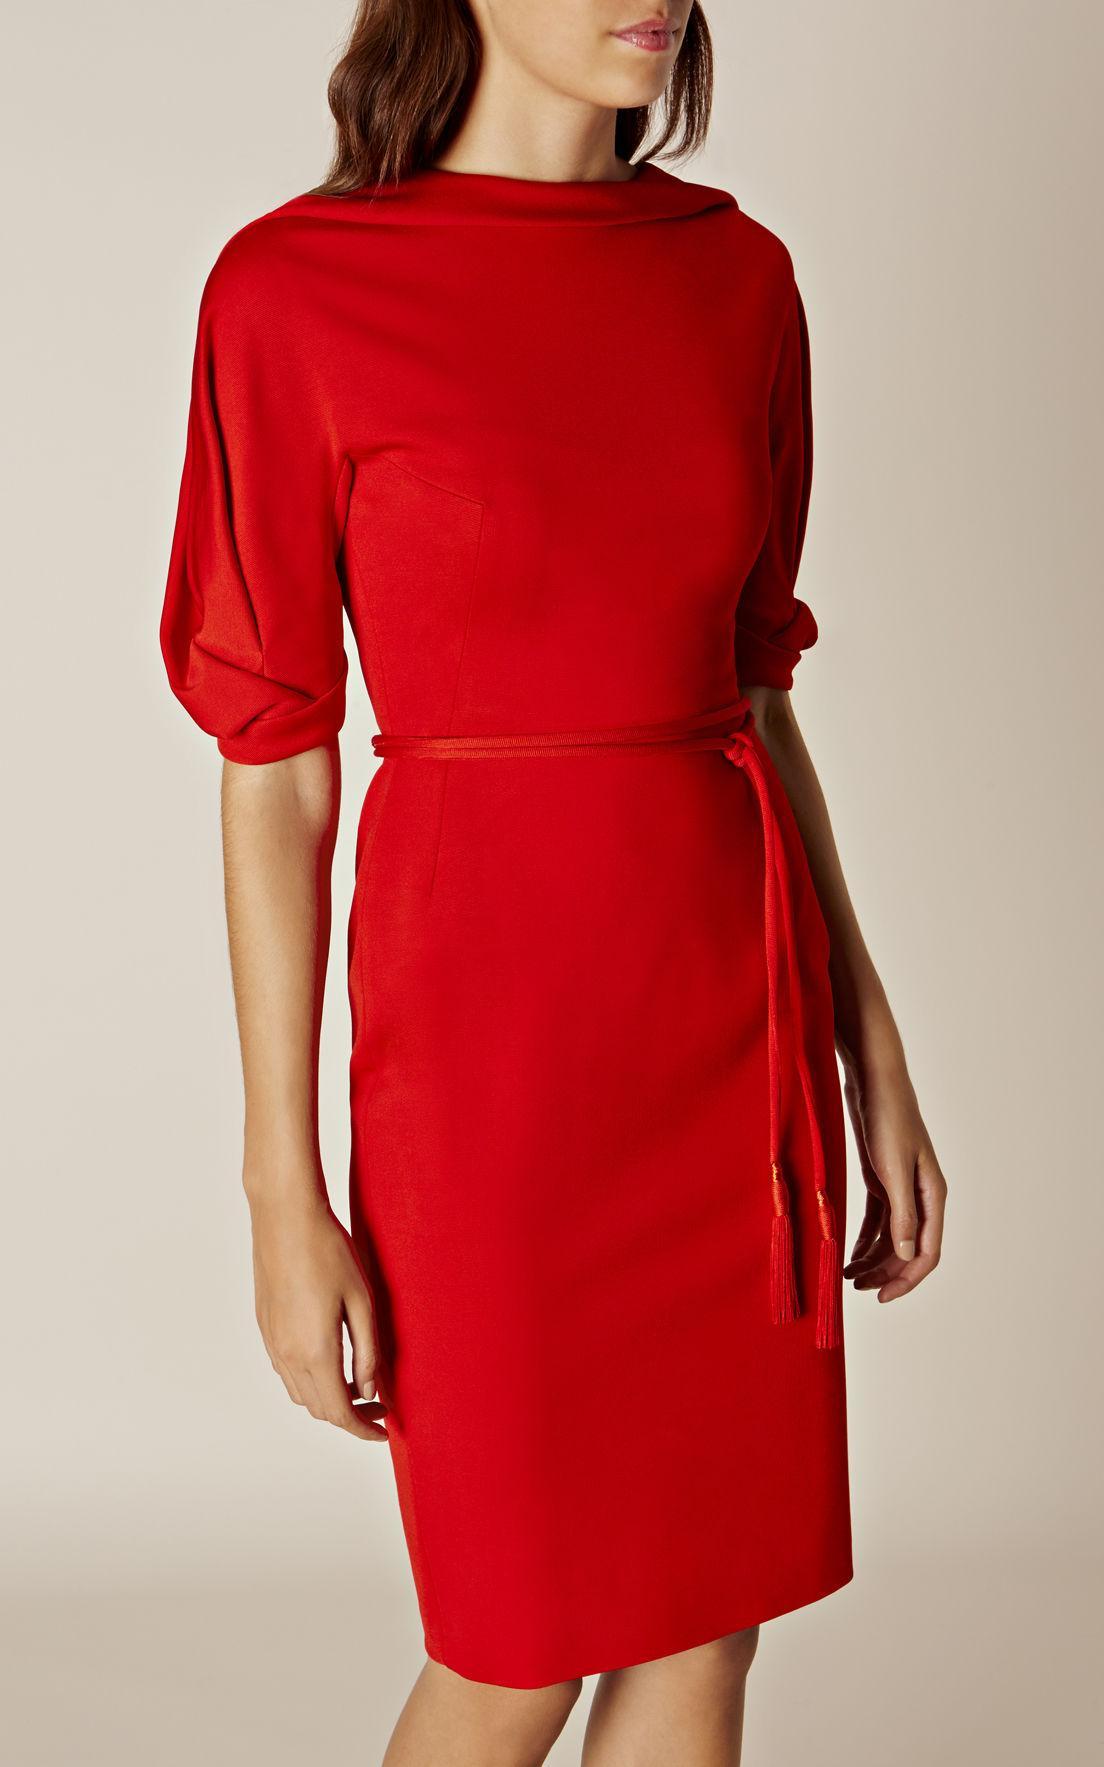 Raw silk dresses women s cut out dresses women s red flare dresses